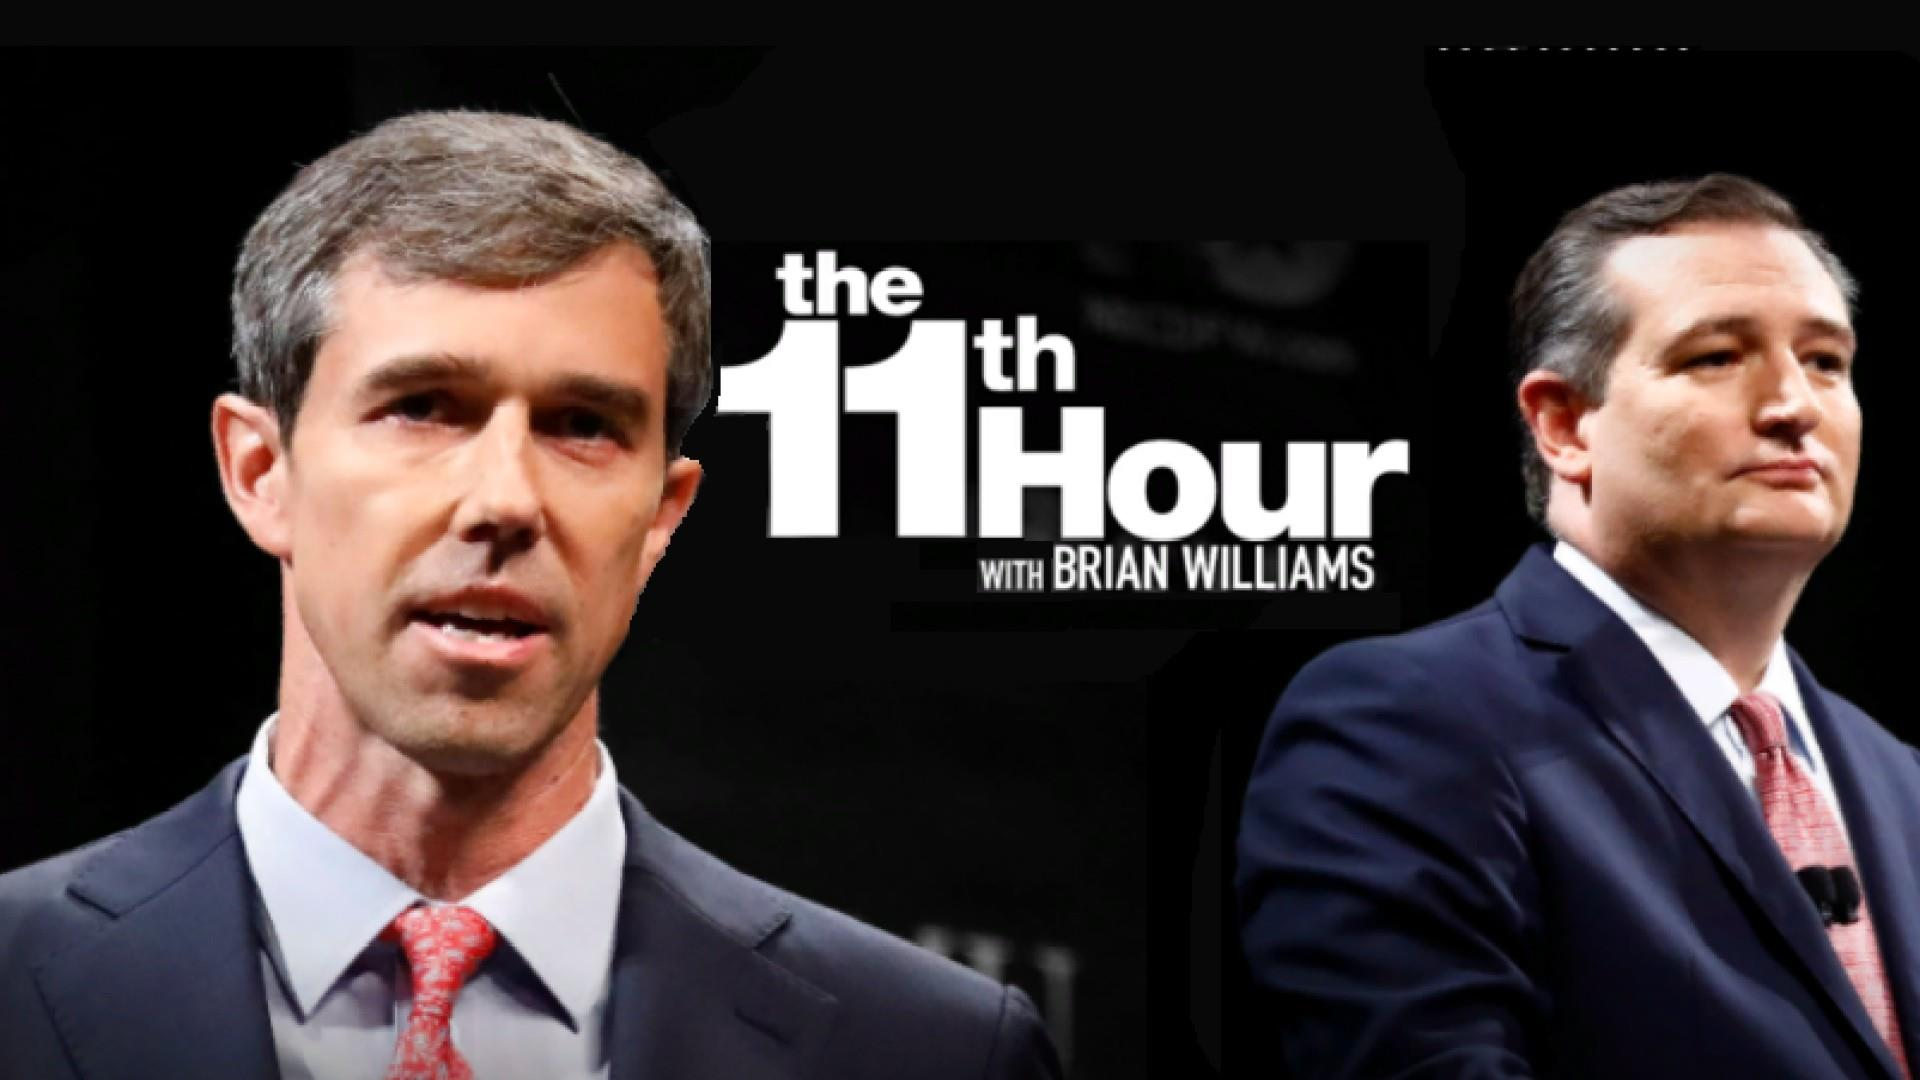 Beto O'Rourke & Ted Cruz trade jabs at fiery Senate debate